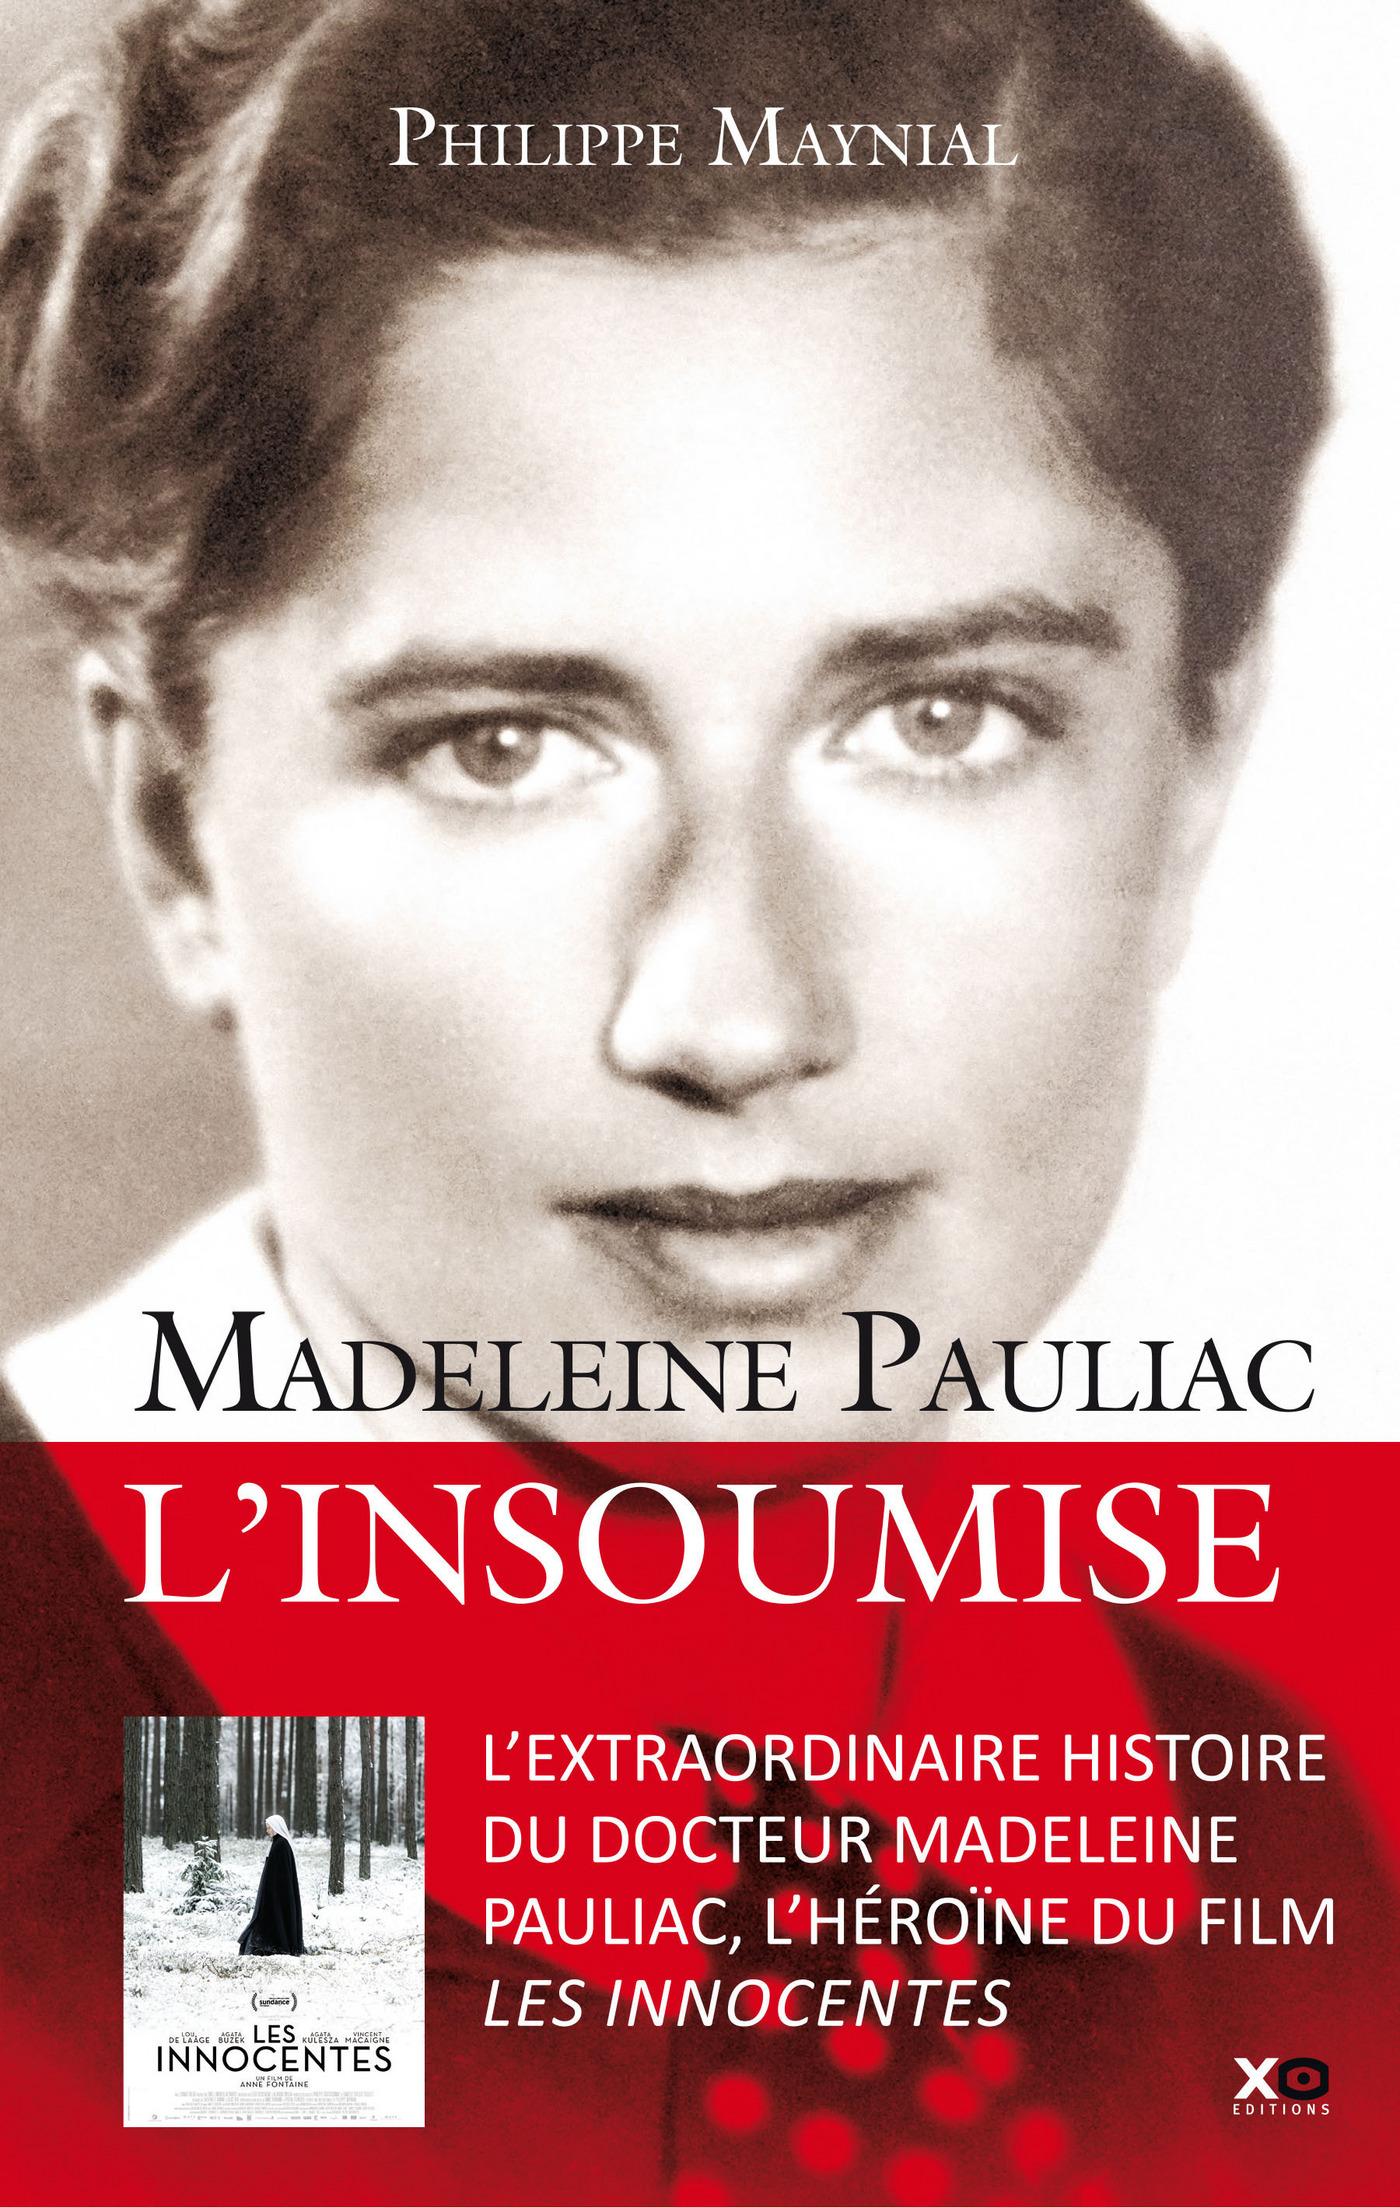 Madeleine Pauliac : L'insoumise